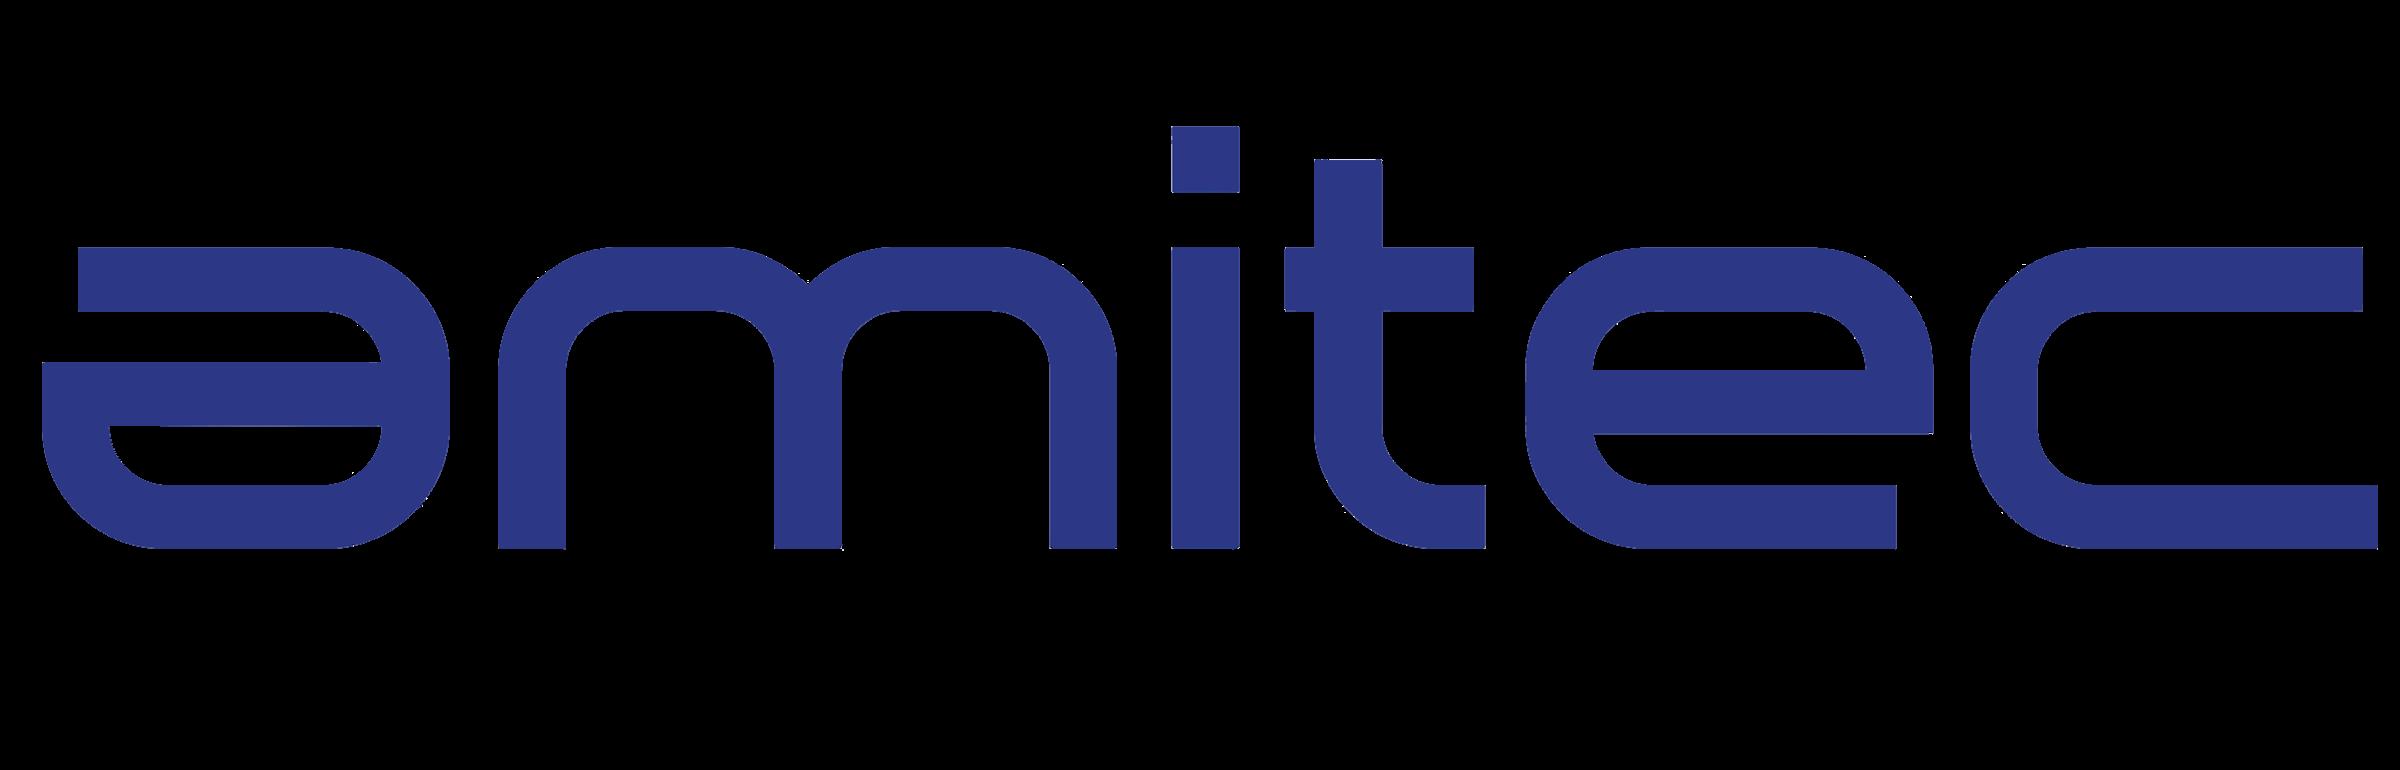 Amitec Electronics Ltd.